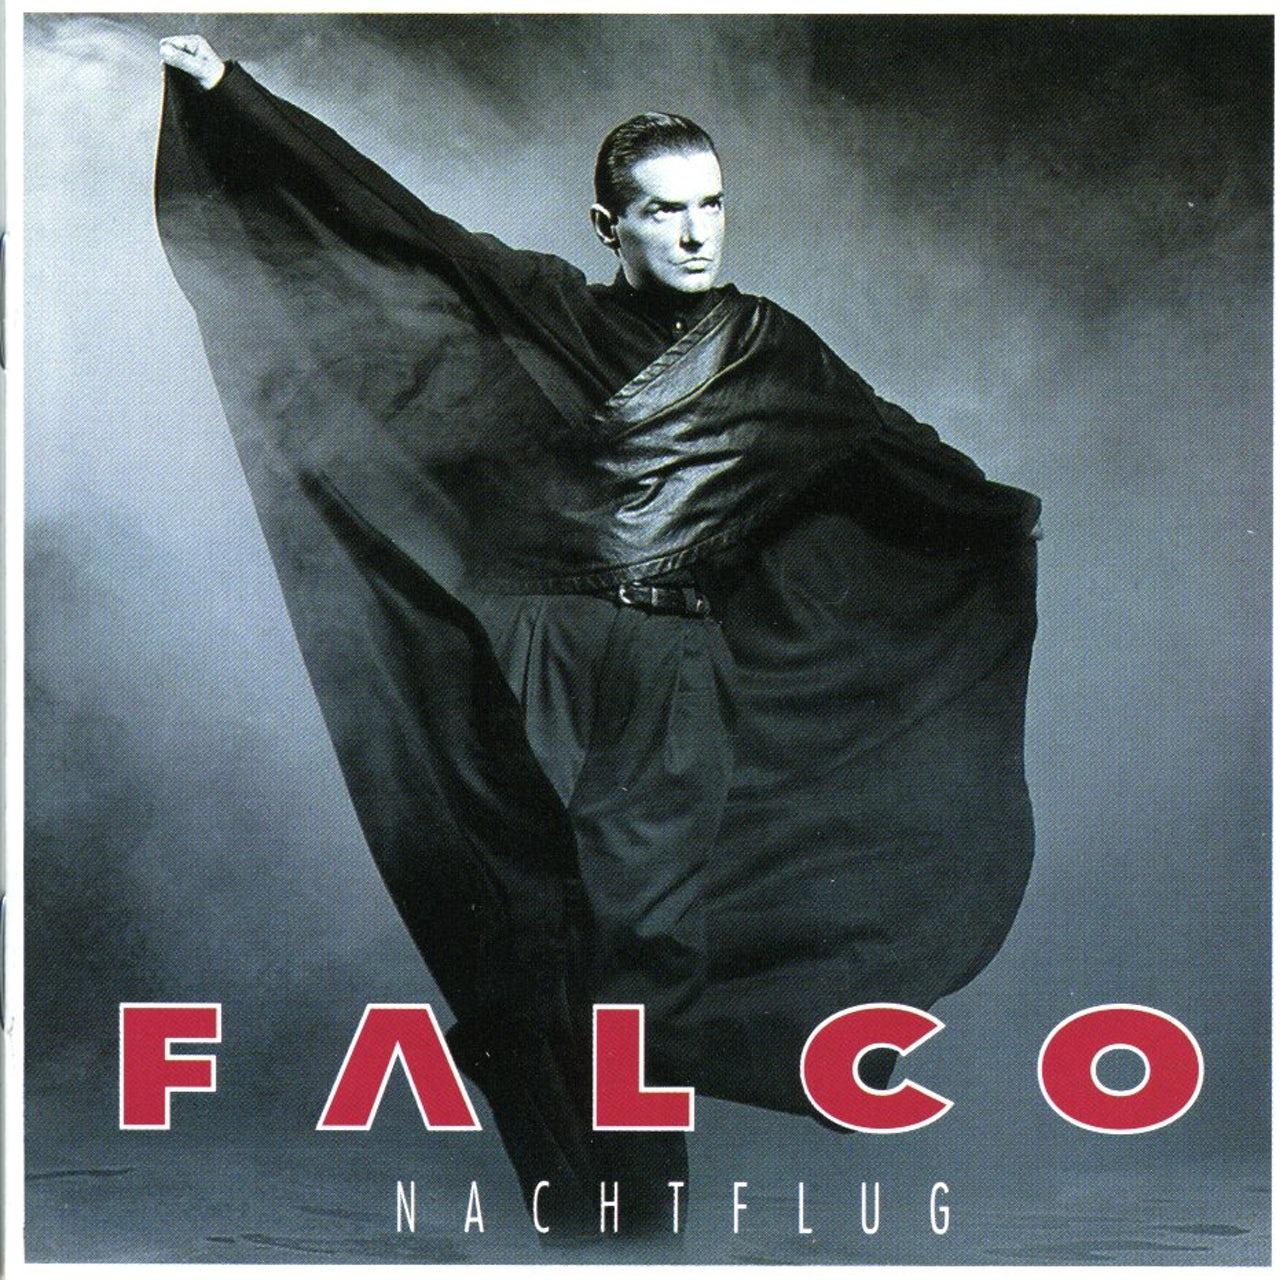 Falco Falco. Nachtflug (2 CD) авиабилеты 2012